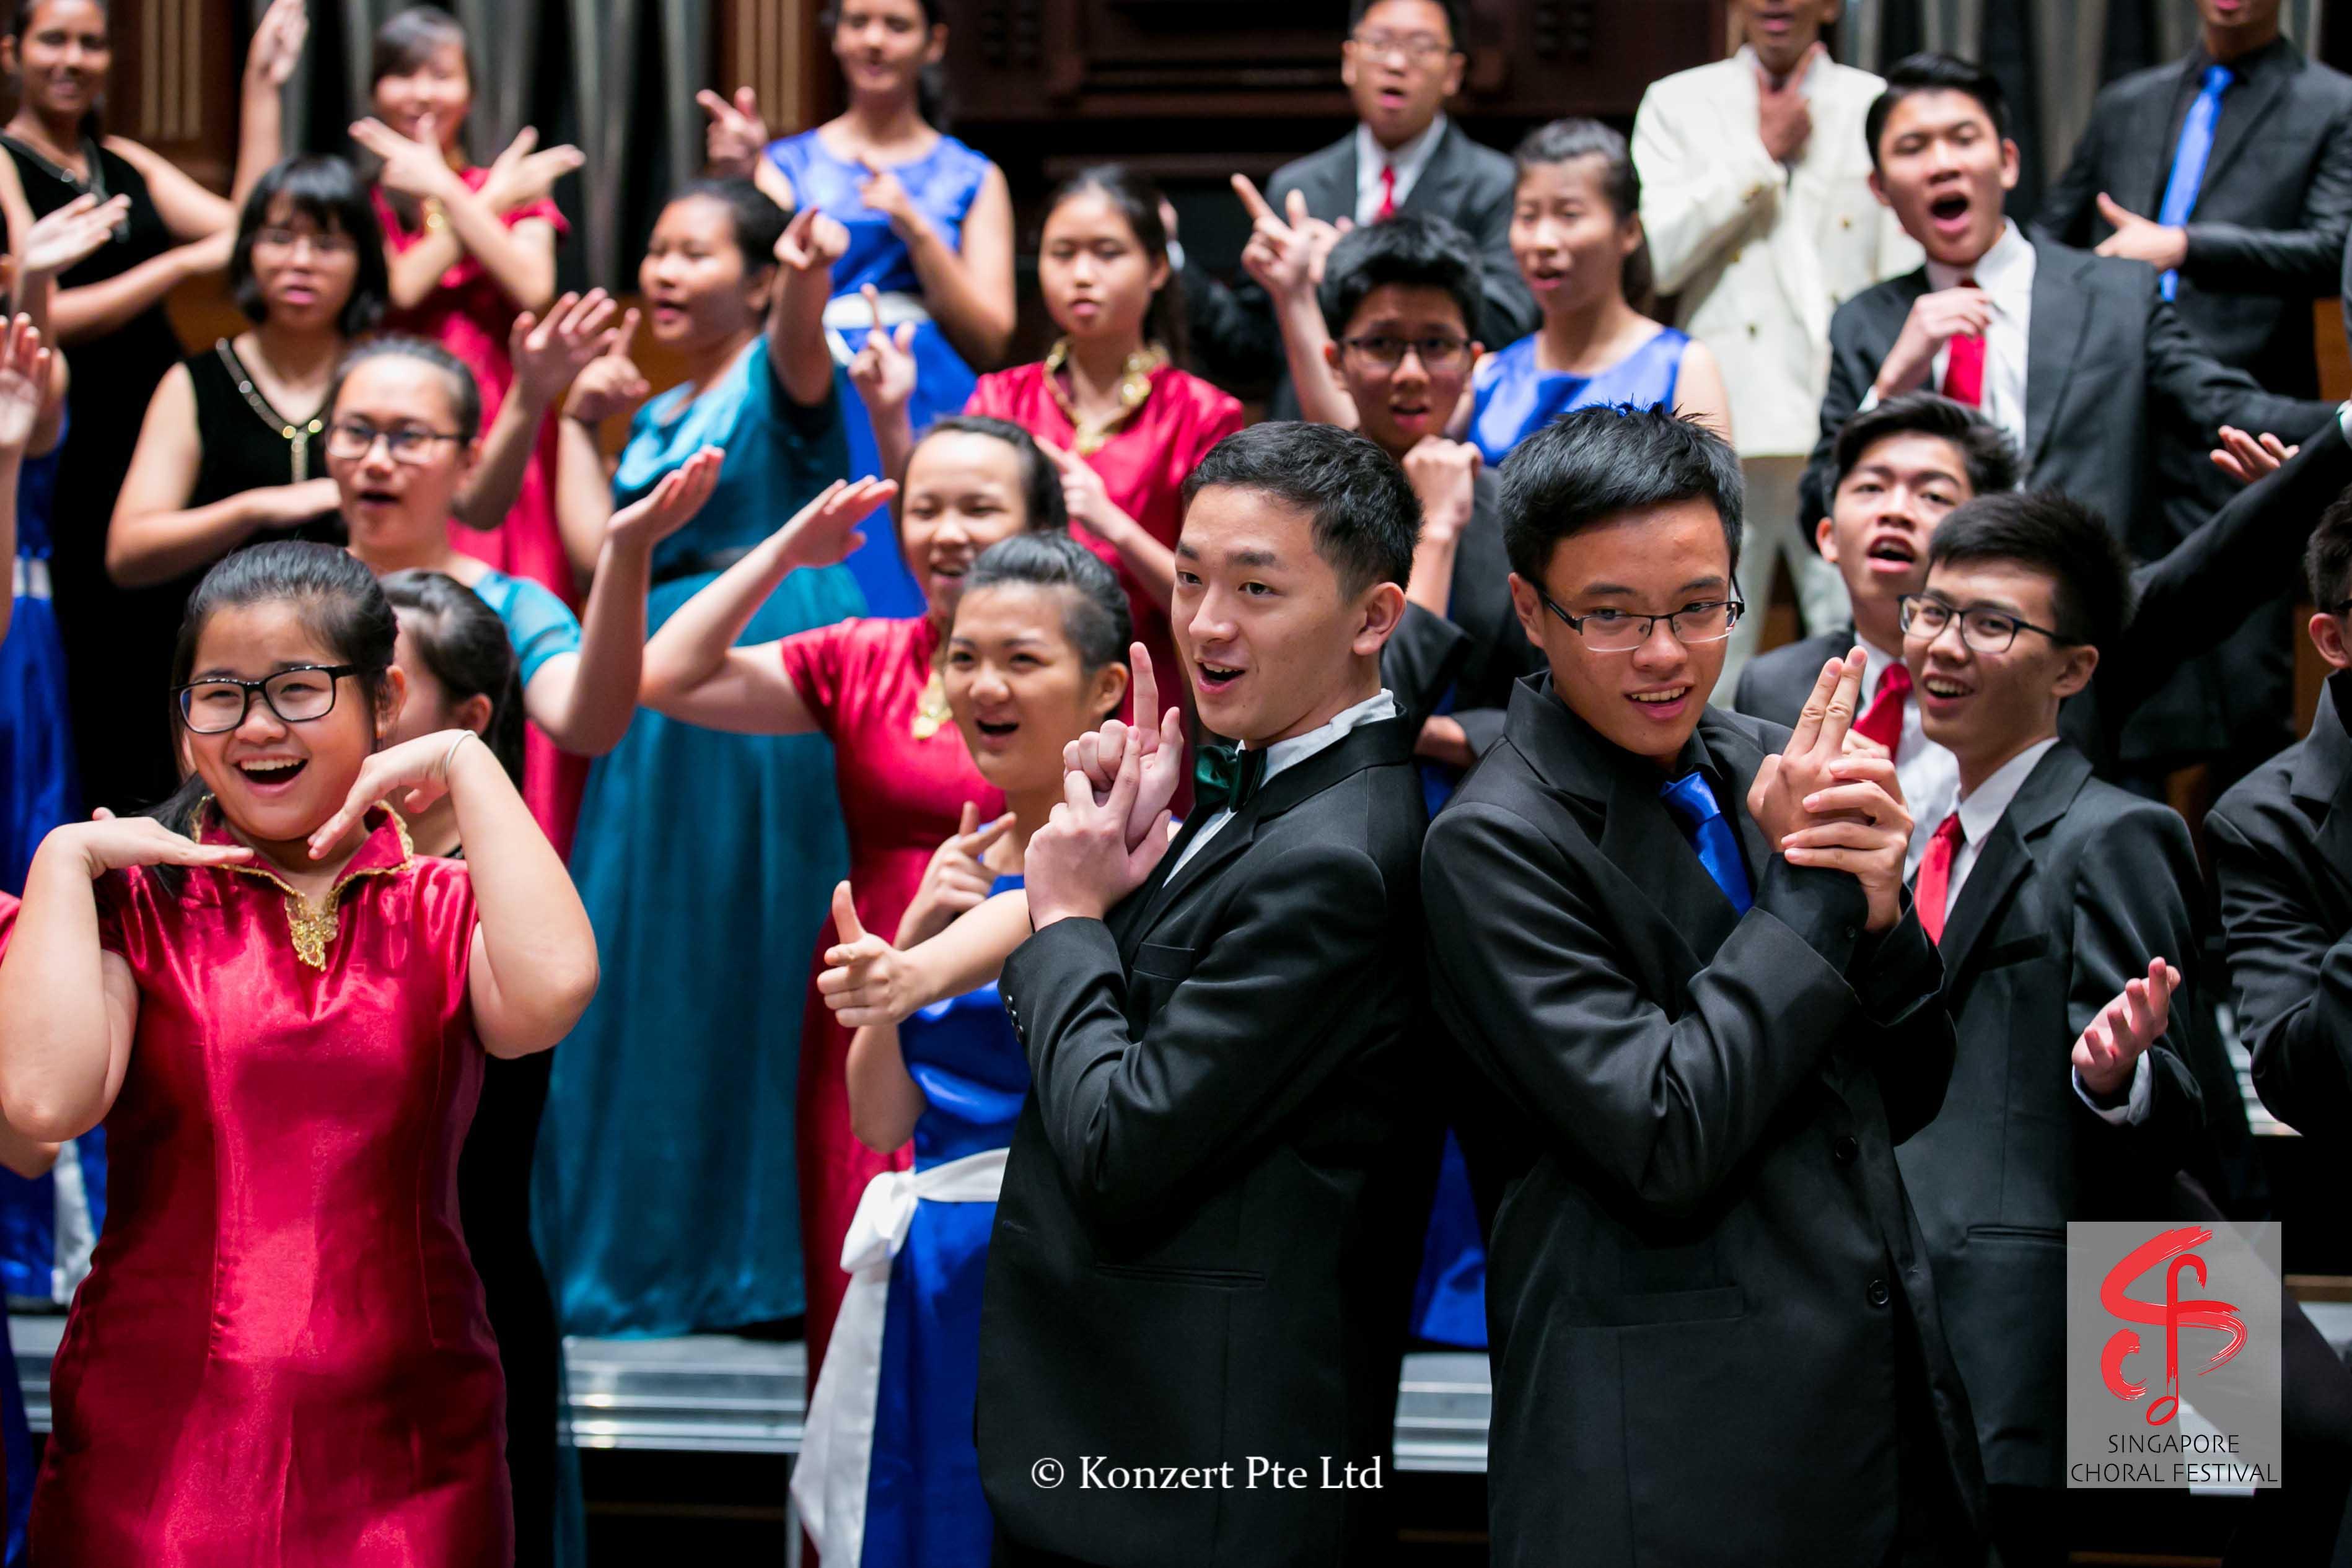 Singapore Choral Festival 7-8-15 (152).jpg